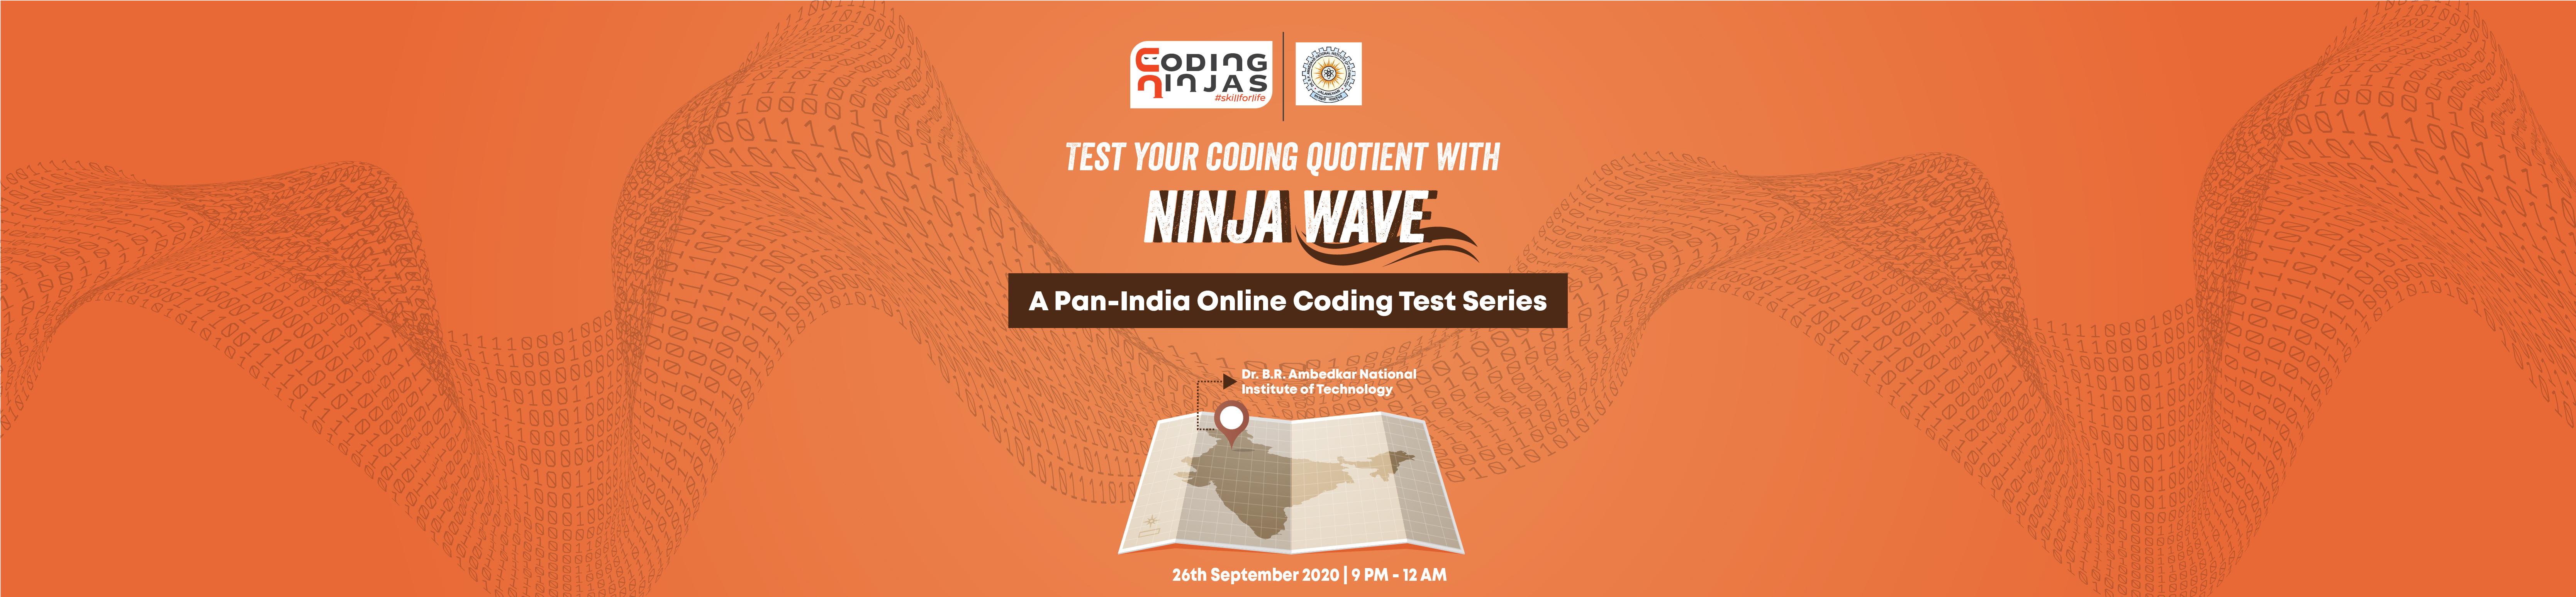 Ninja Wave at Dr. B.R. Ambedkar National Institute of Technology